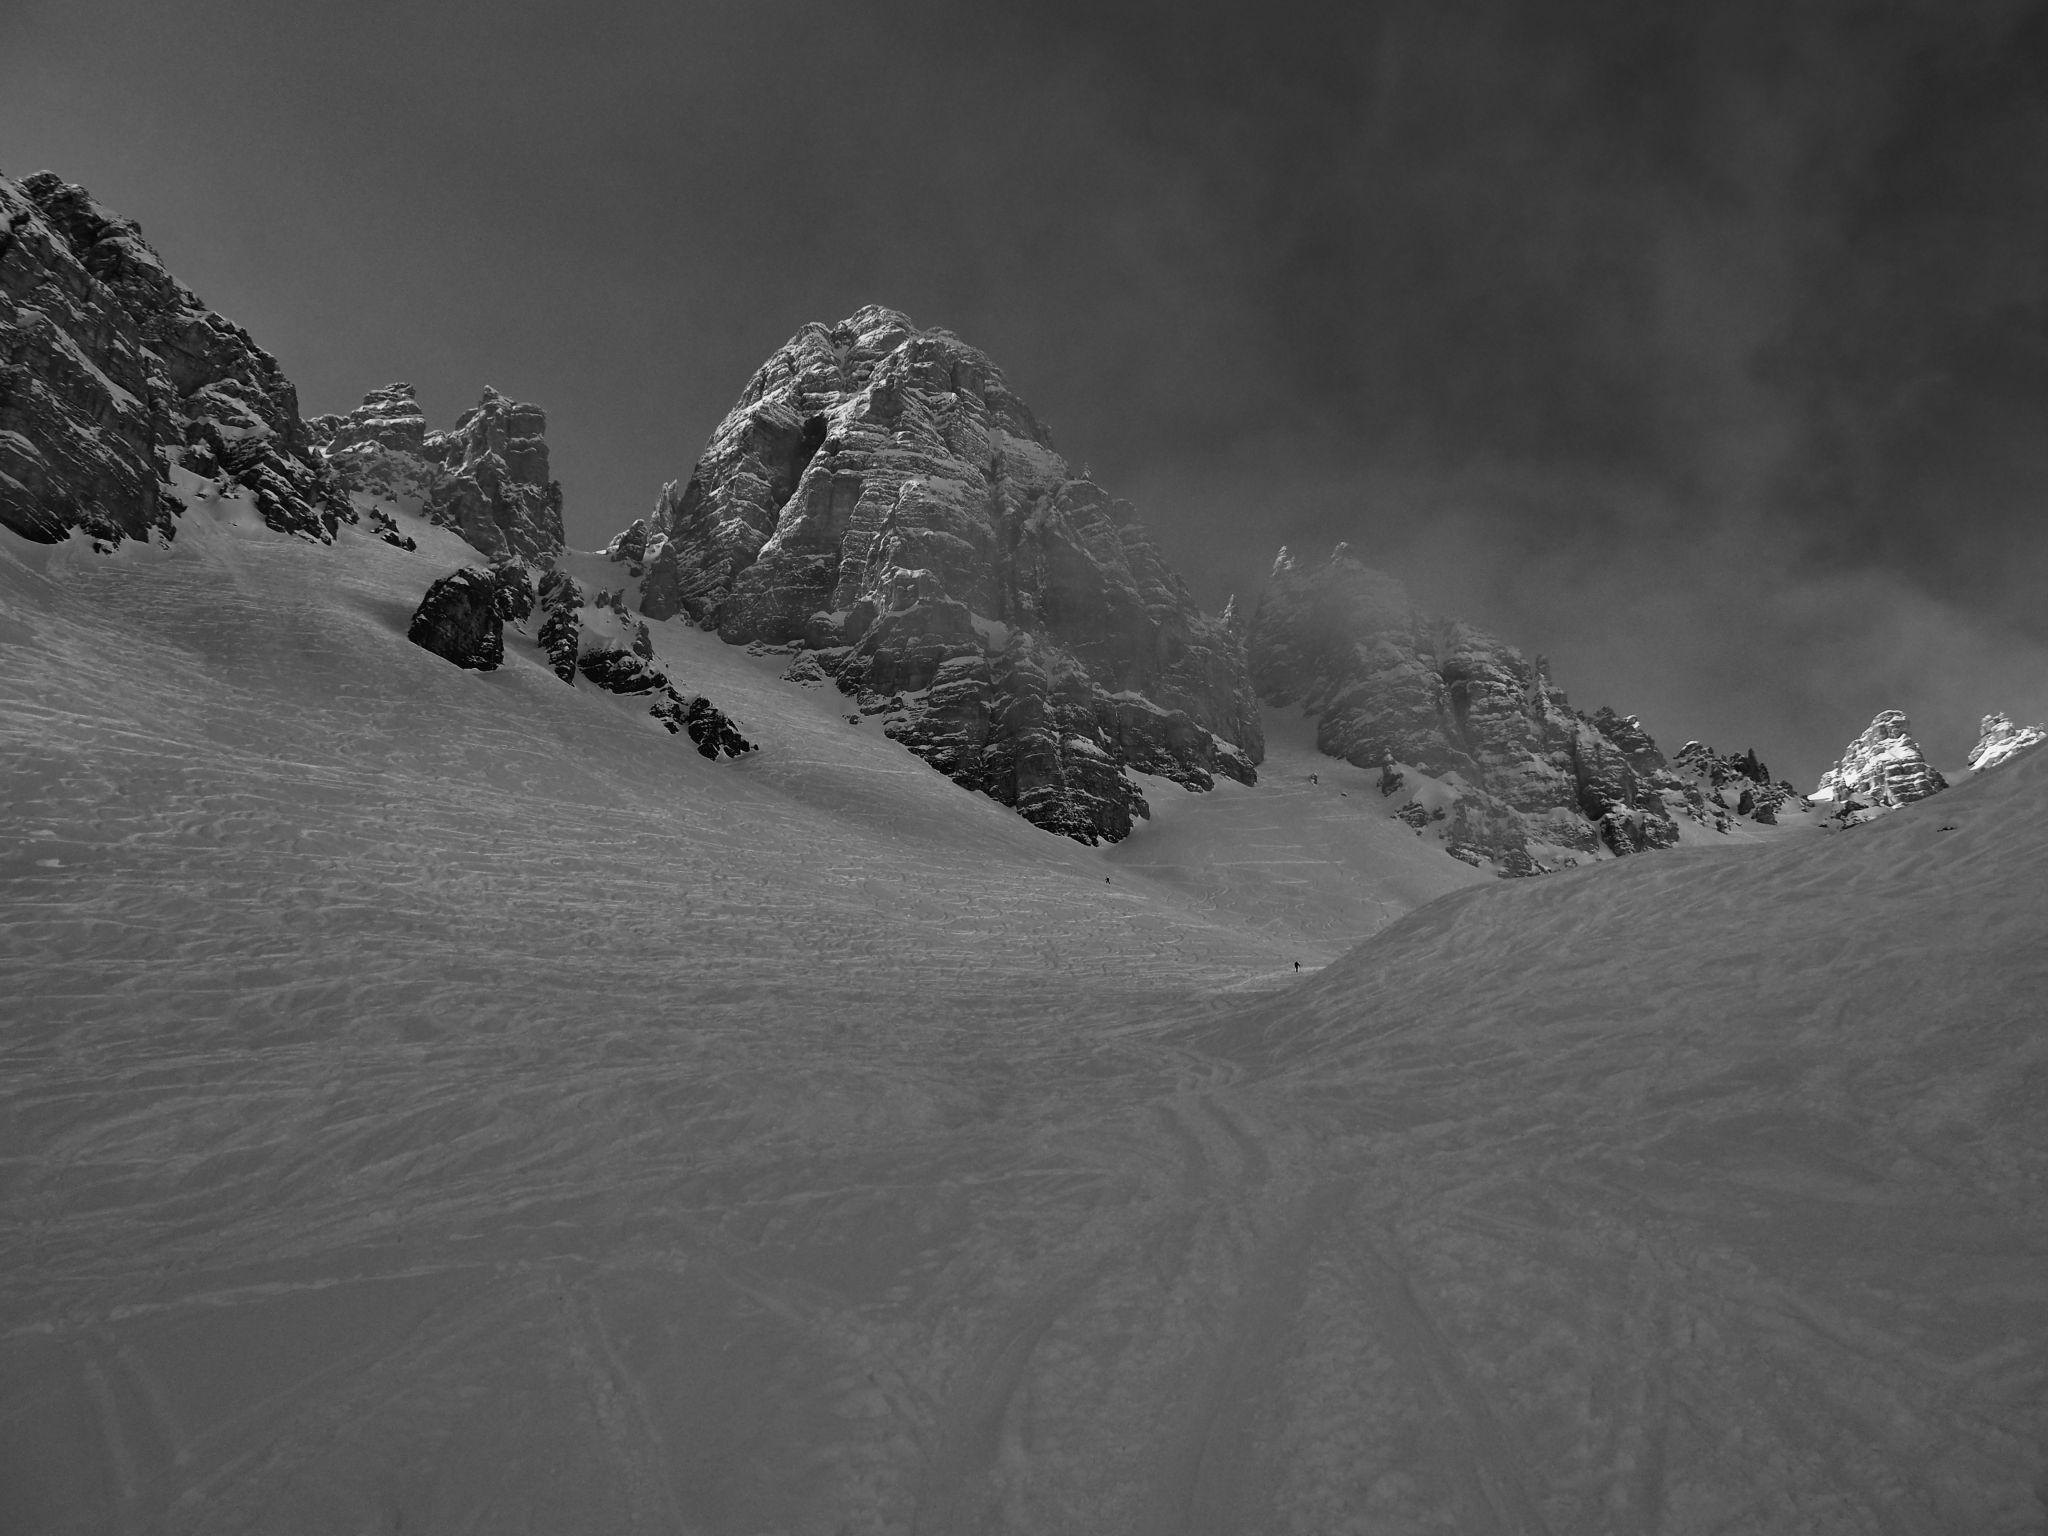 Lizumer Kar in winter time, Austria